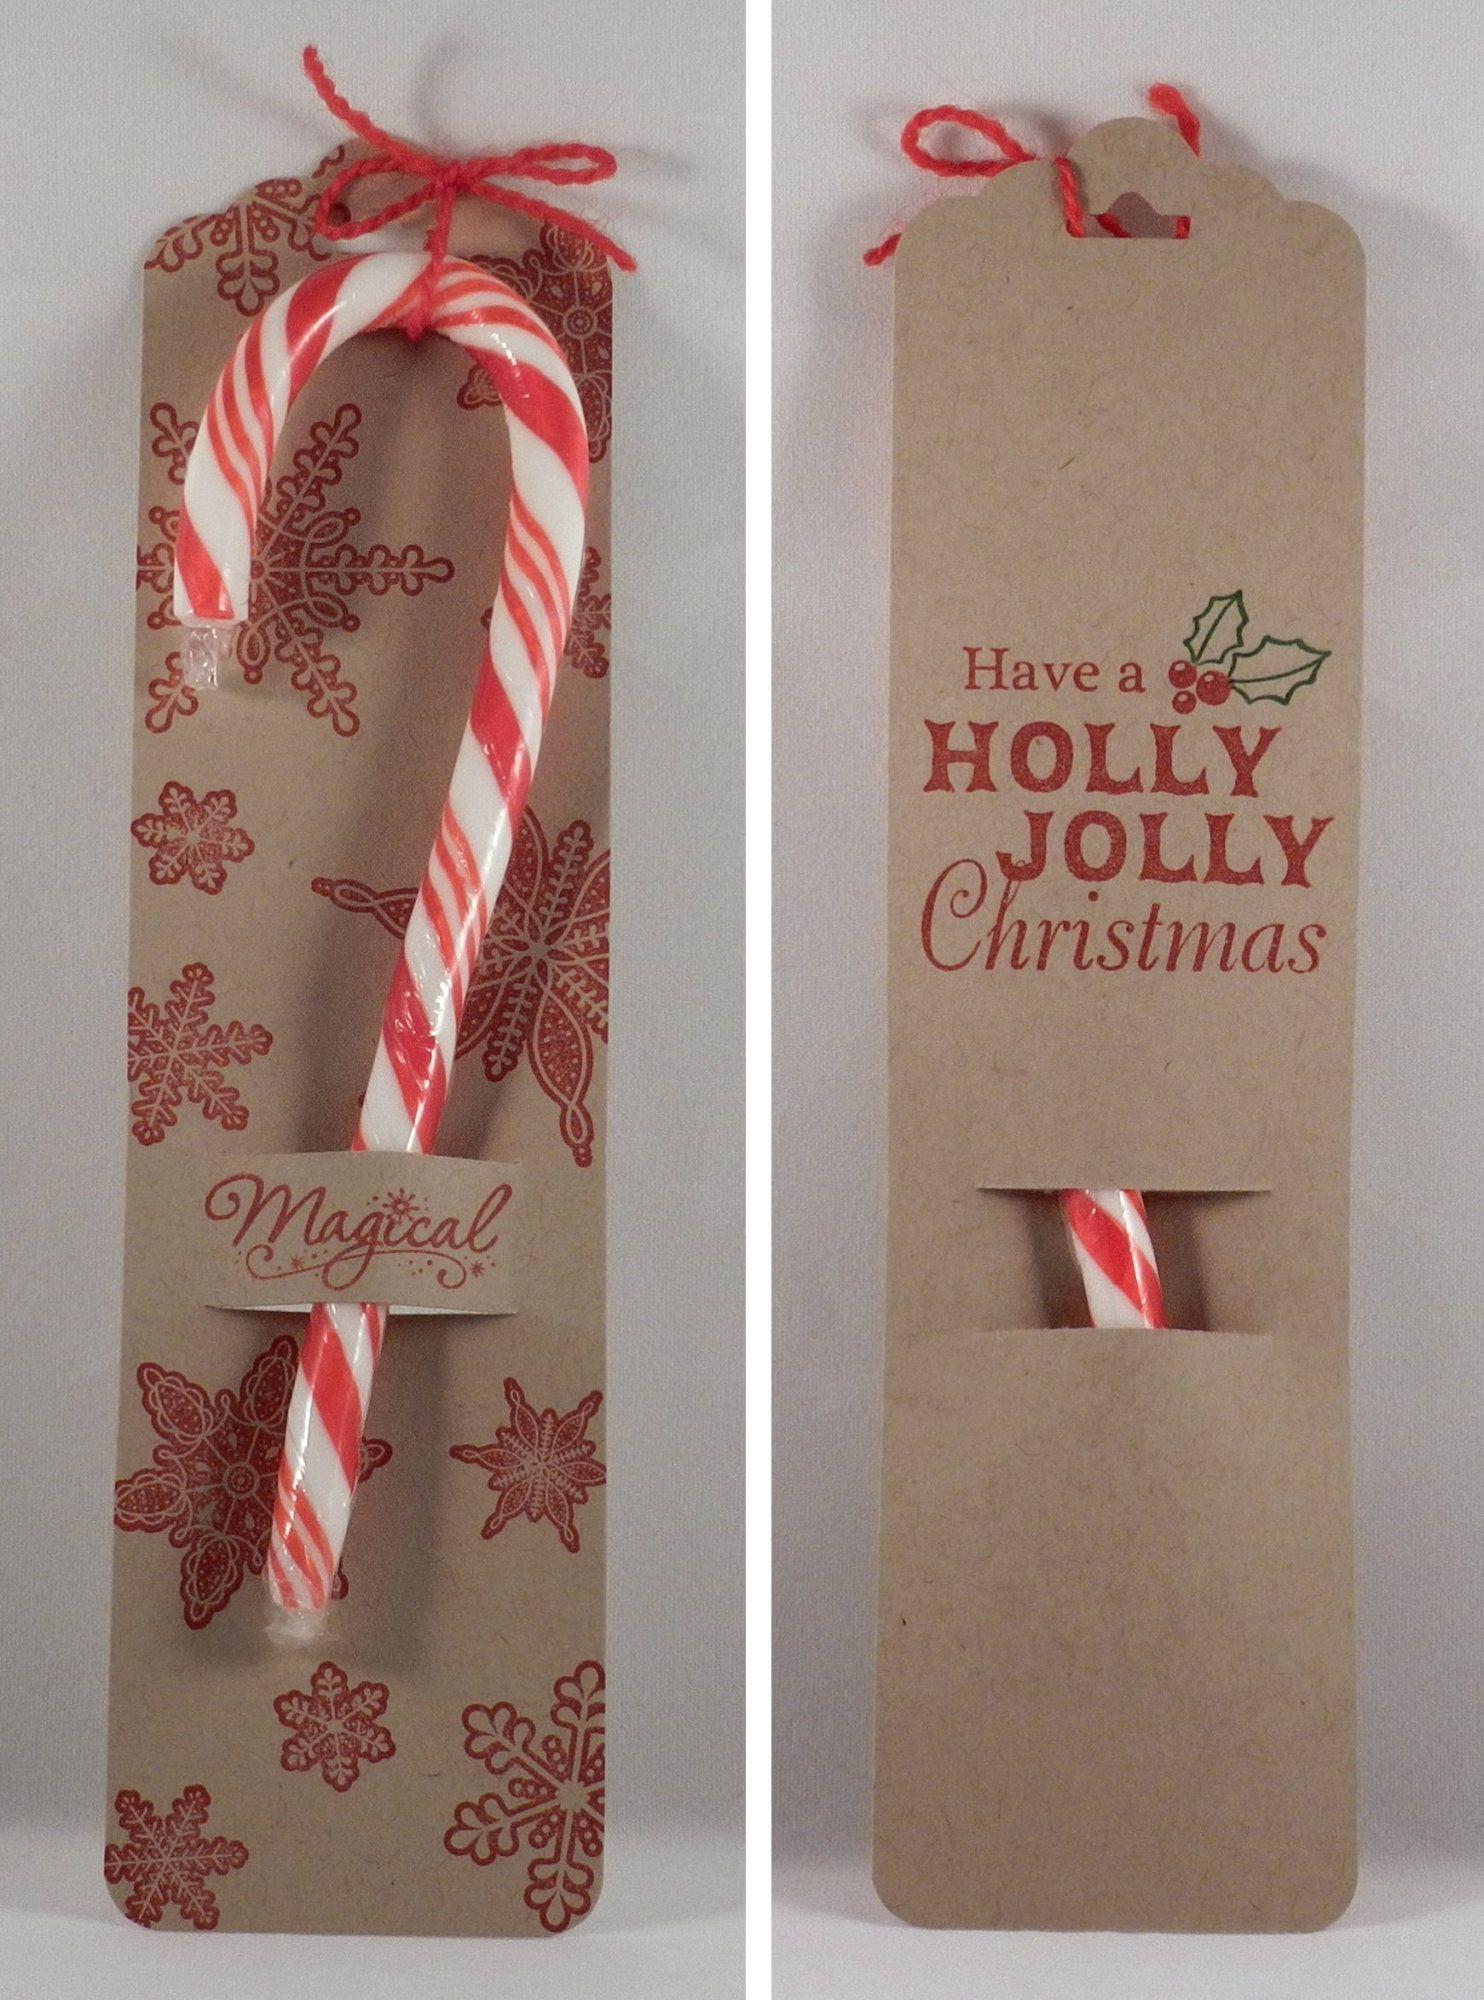 Candy Cane Holder Hot Off The Press Flying Reindeer Stamp Set HOTP1071